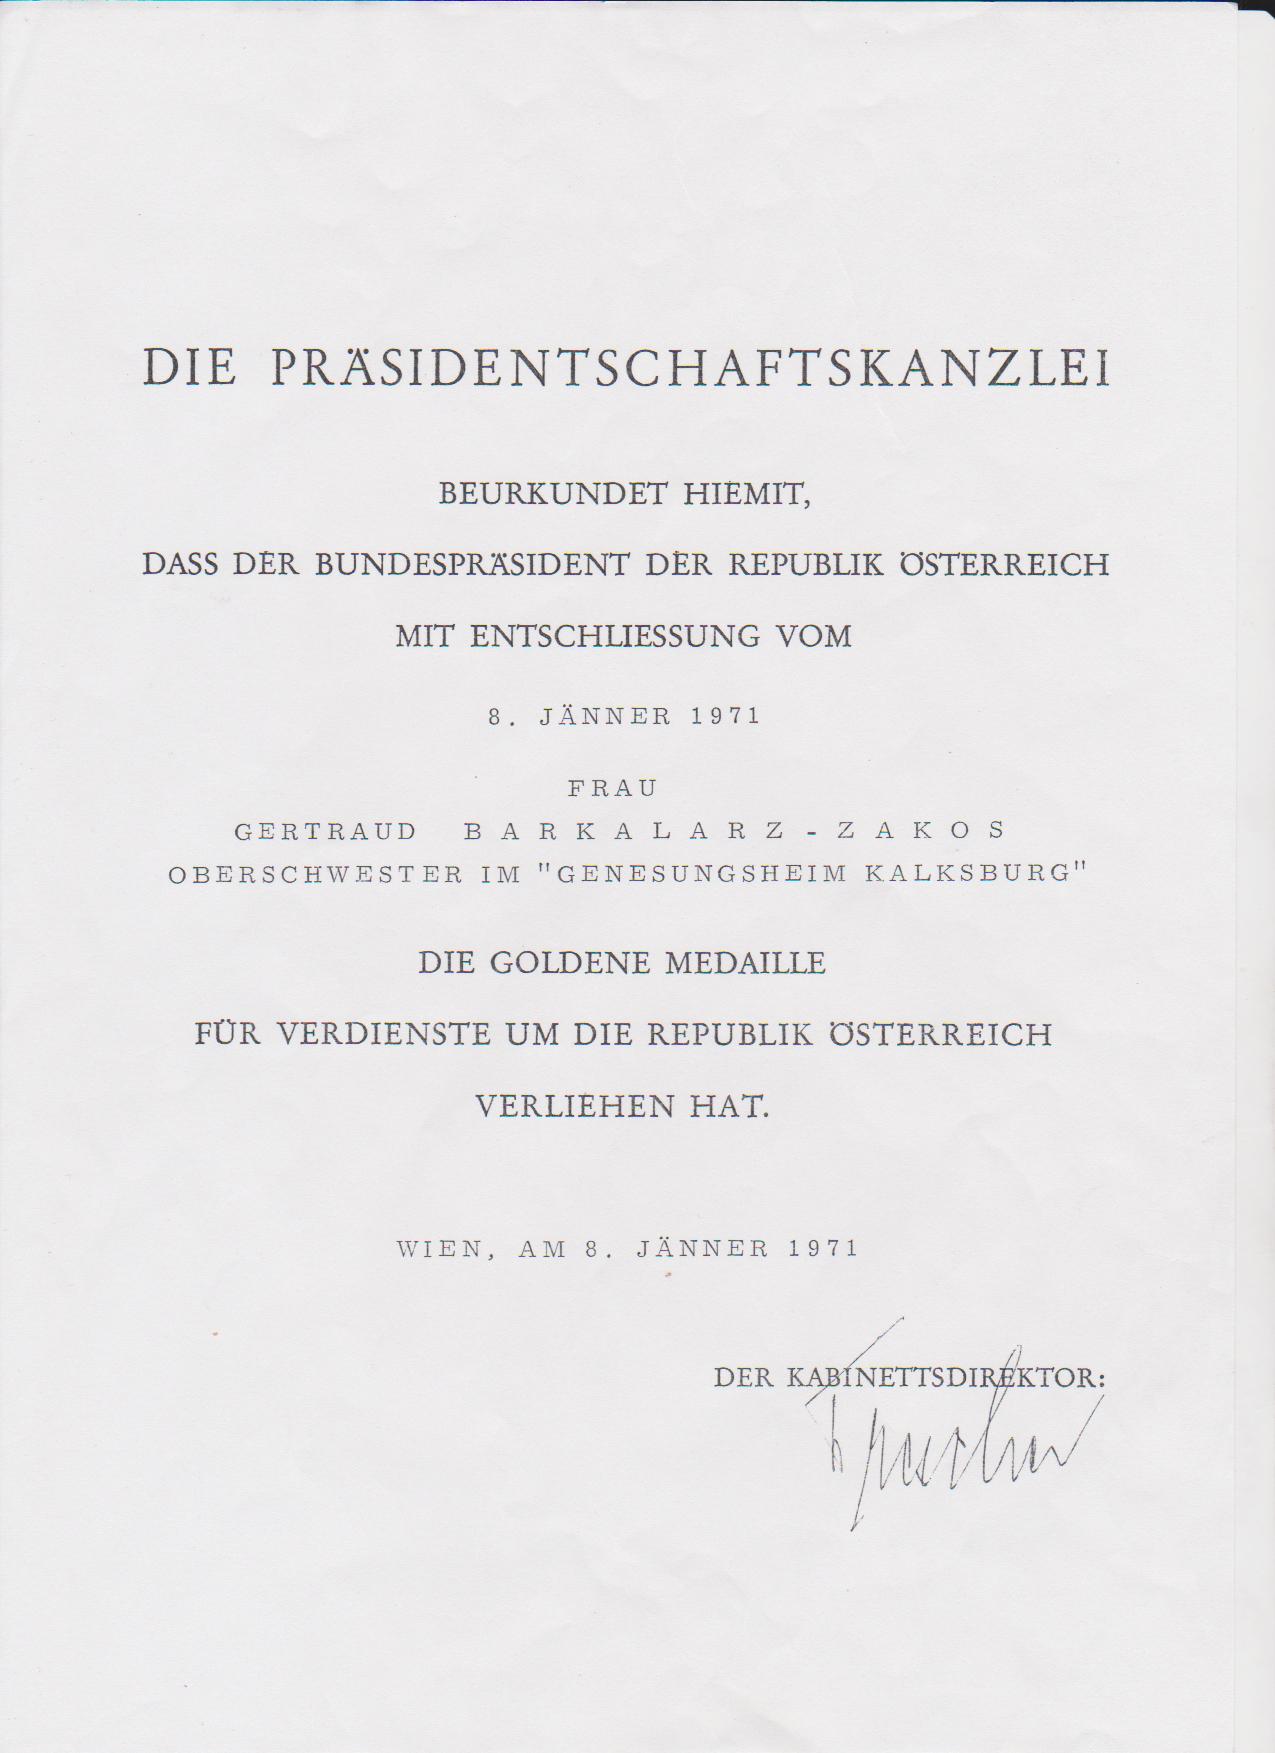 File:Verleihungsurkunde Gertraud Bakalarz-Zakos.jpg - Wikimedia Commons